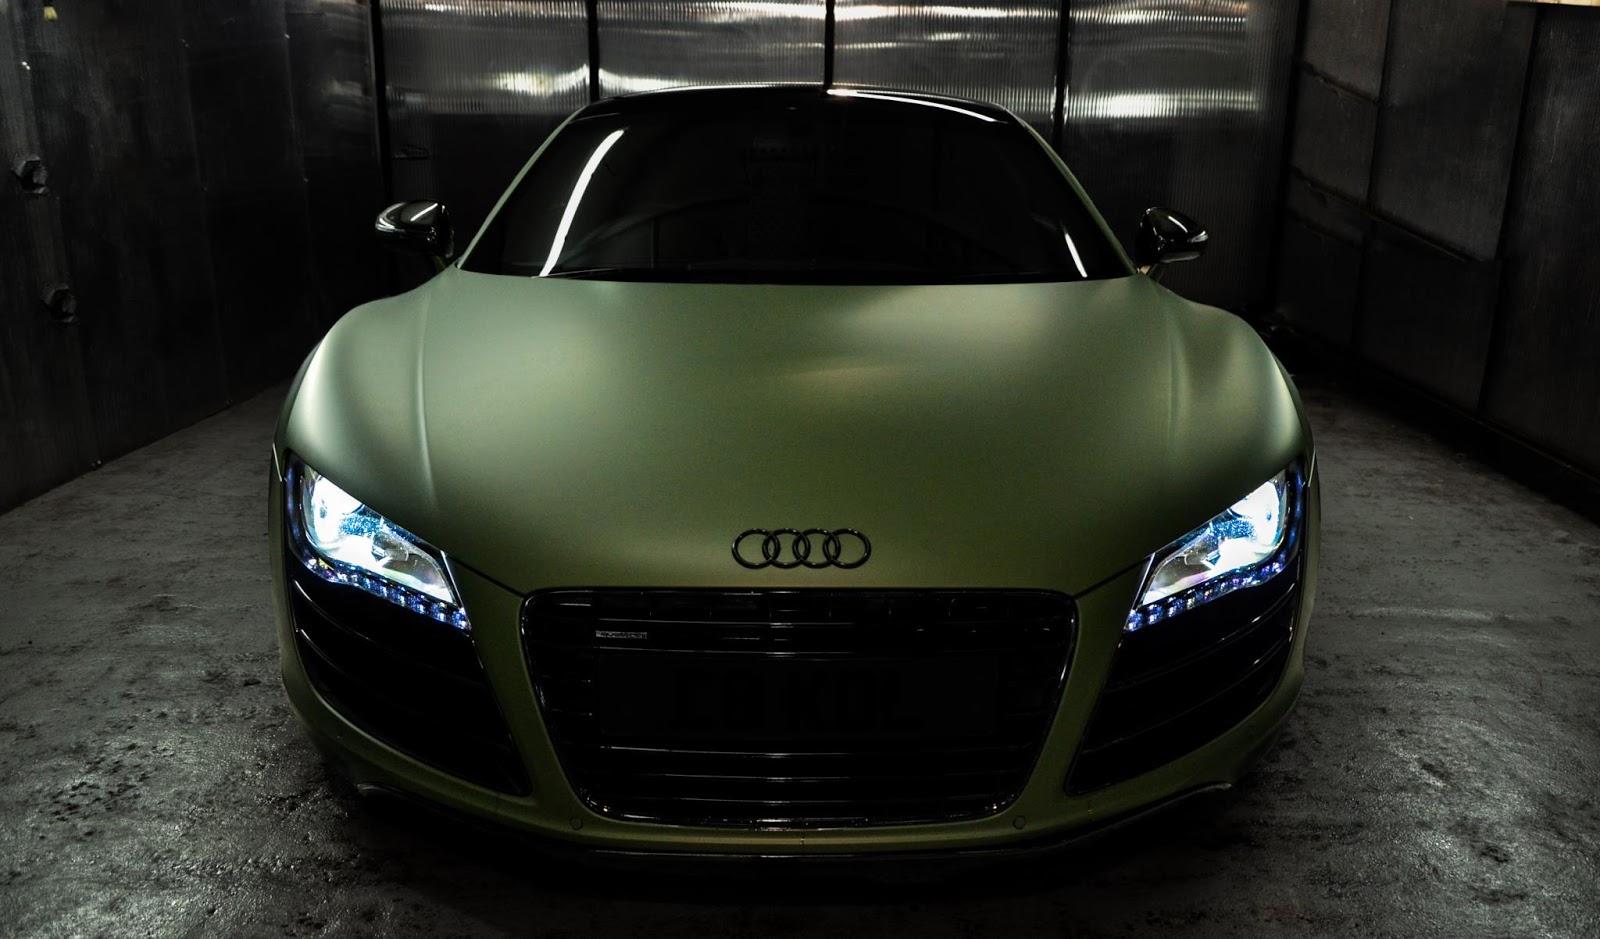 Matte Fanatic: Matte Army-green Audi R8